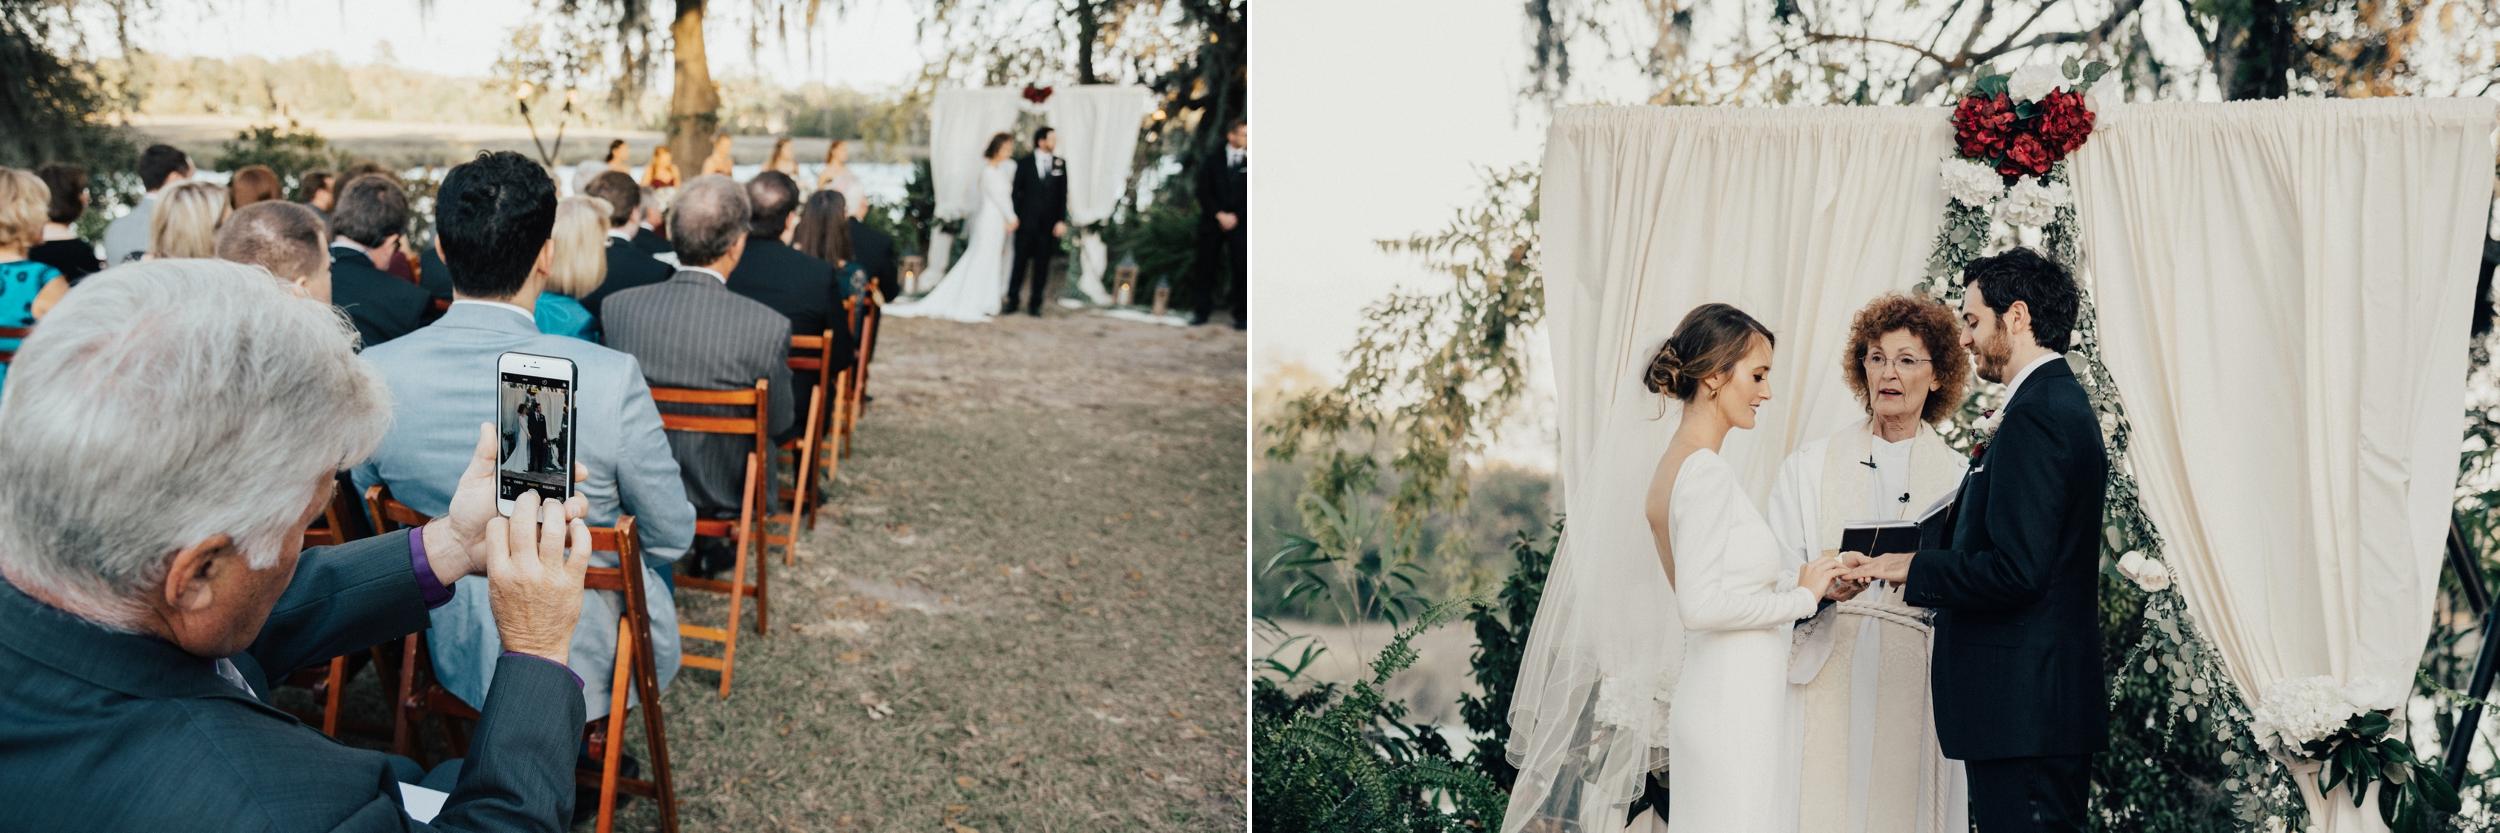 Charlestonweddingphotographer-75.jpg